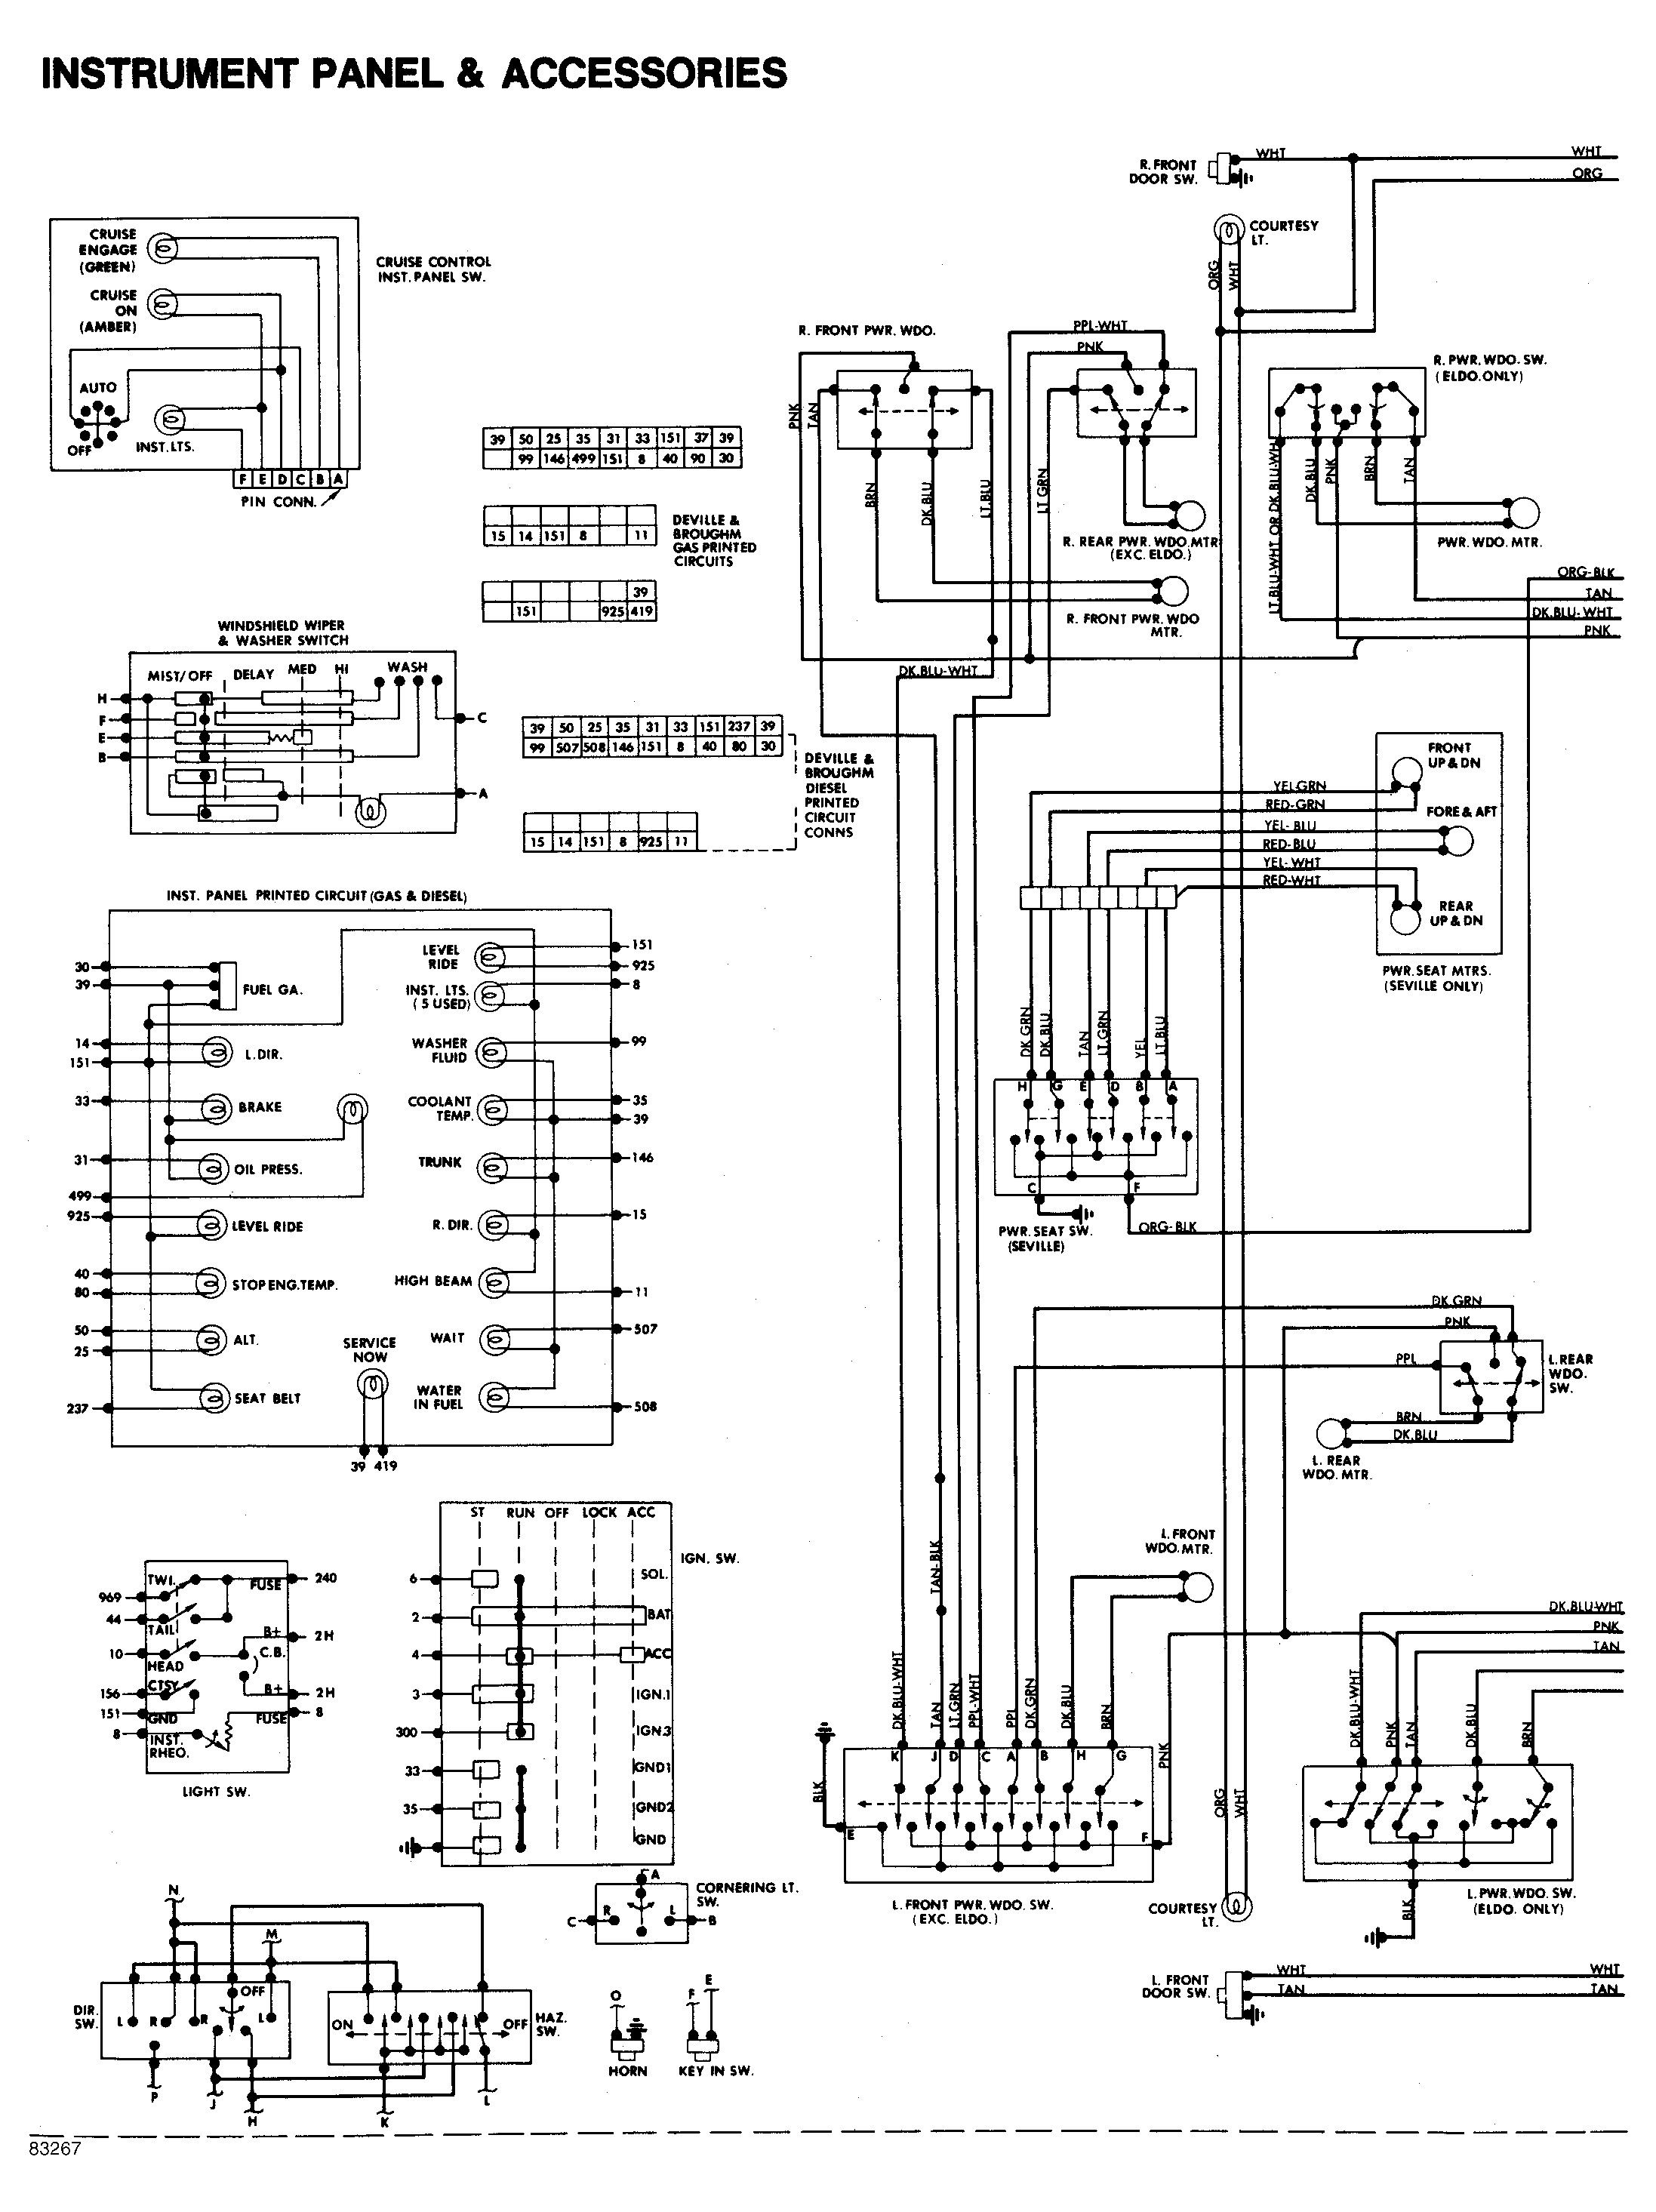 daewoo lanos wiring diagram honeywell frost stat nubira 2 schematic library 1998